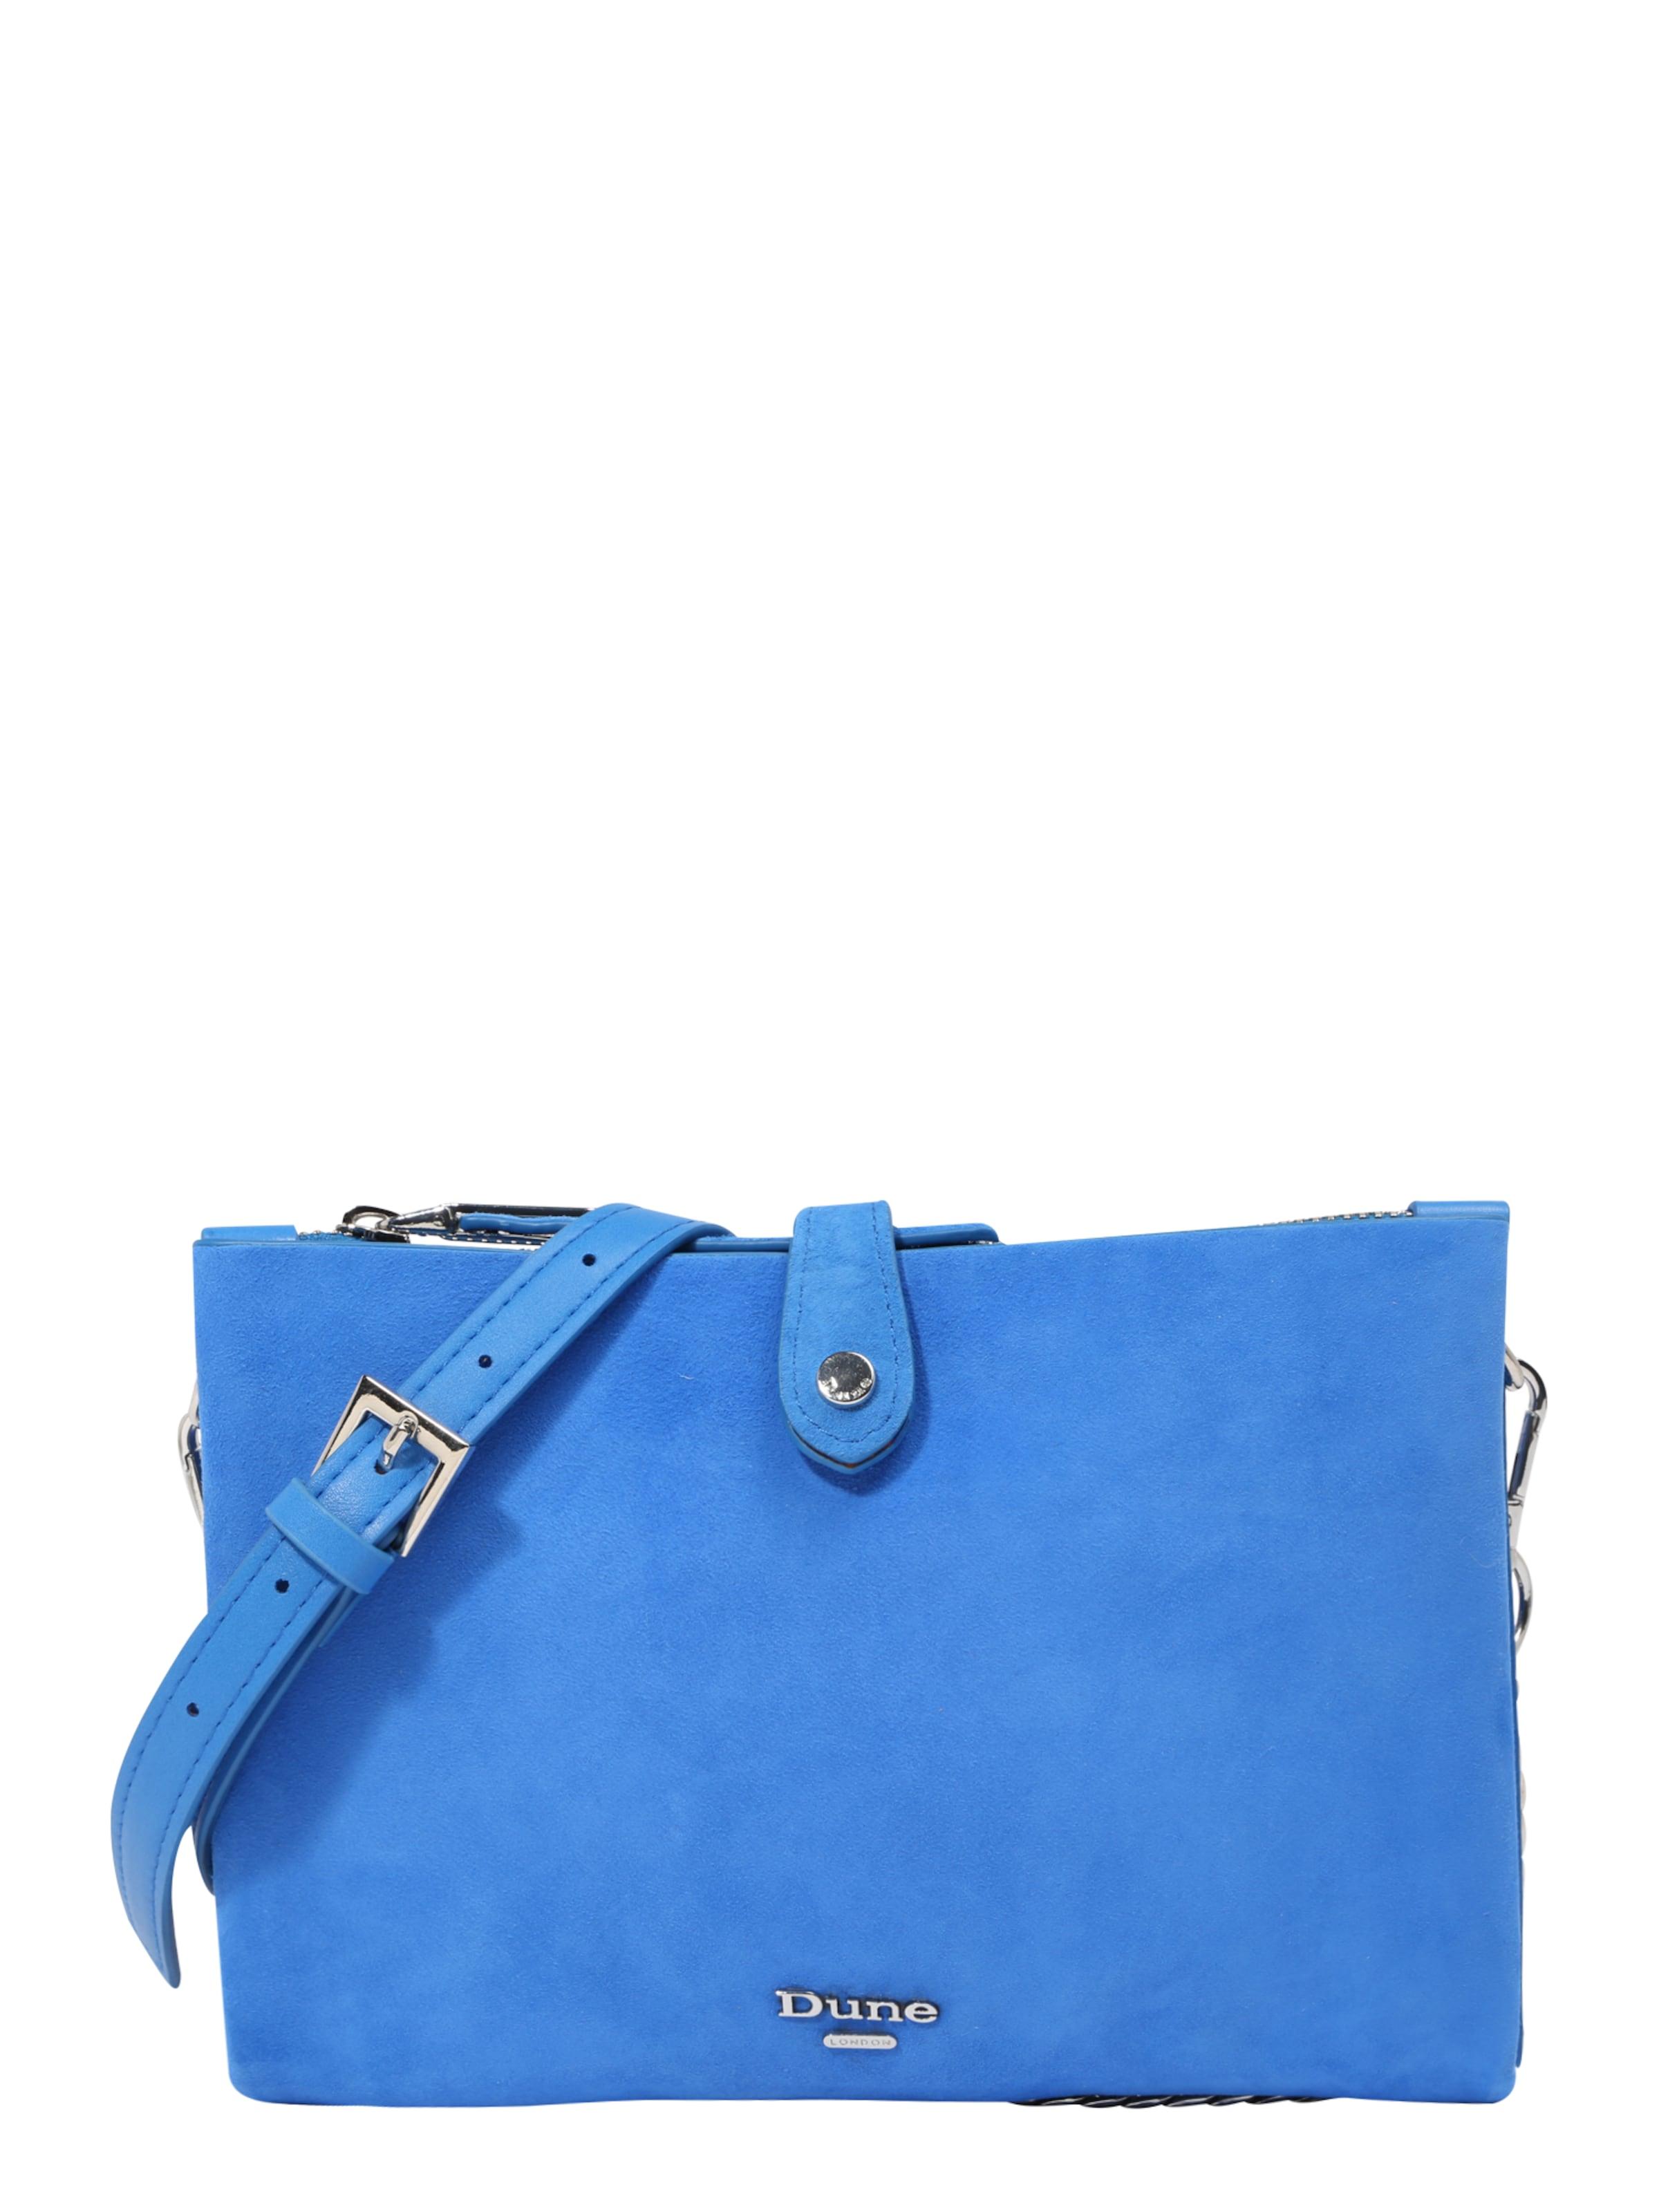 Blau Dune 2' 'etta London Tasche In 7yYbf6g